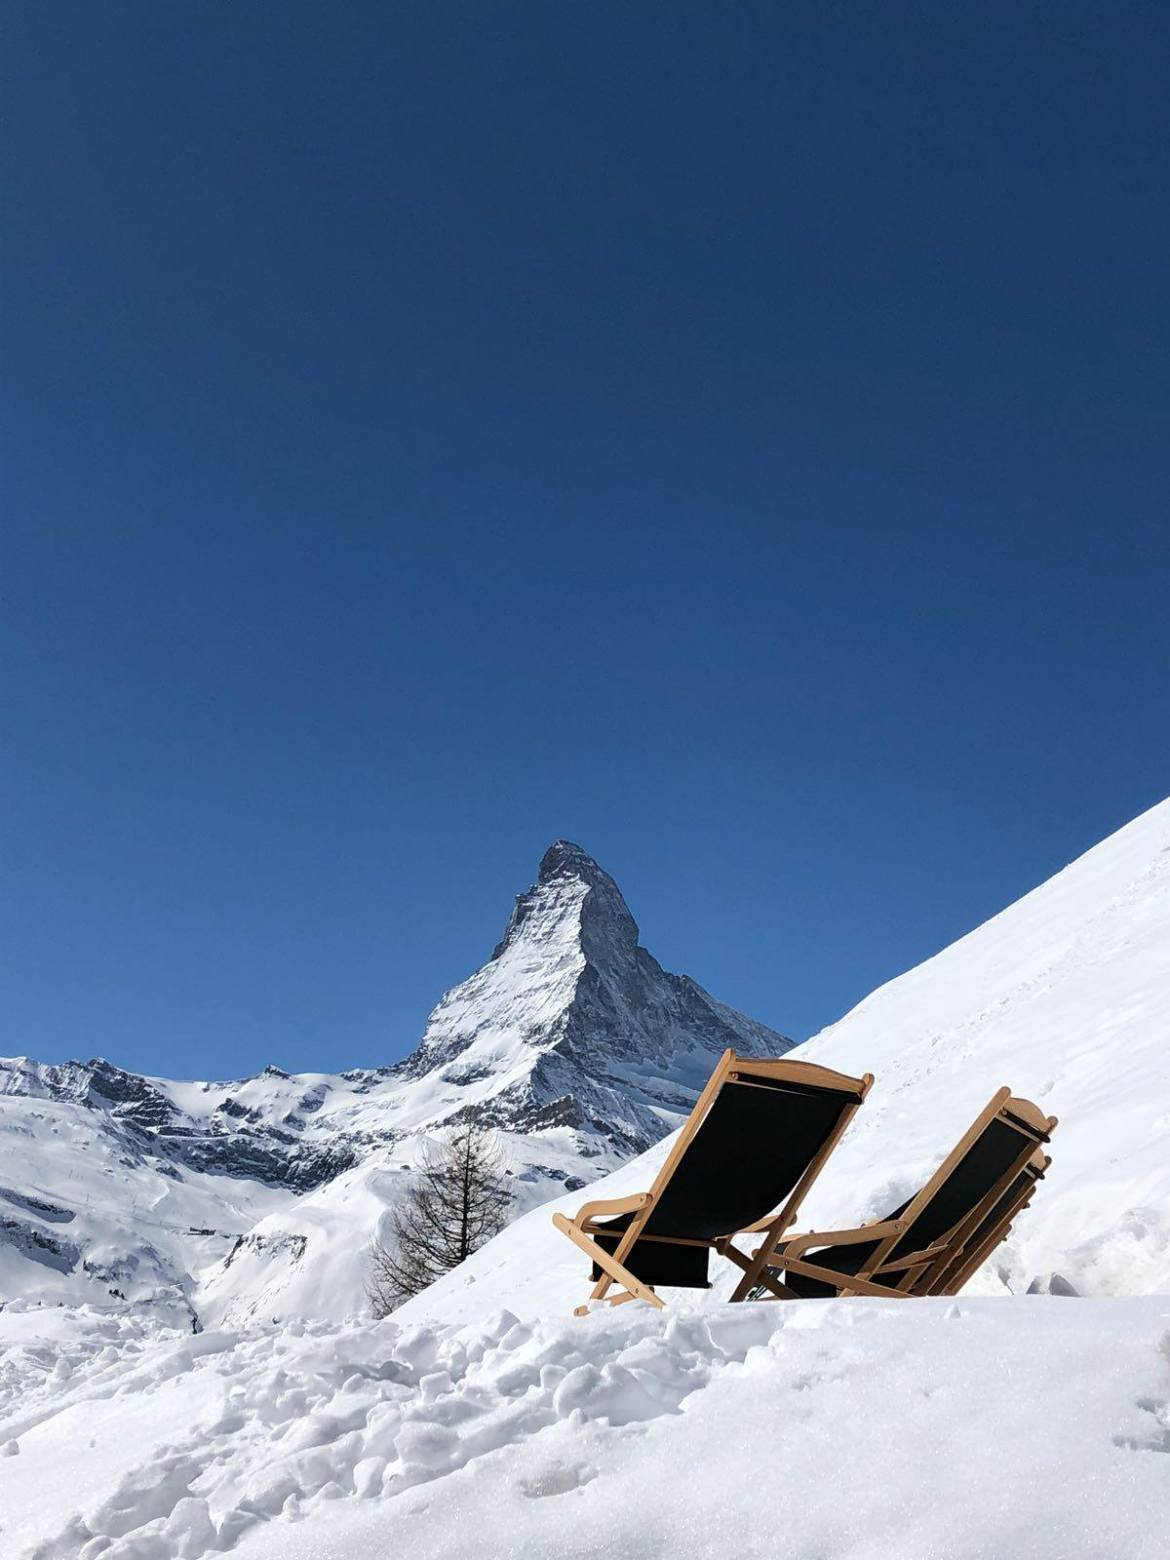 spring skiing Alps, april skiing Europe, spring skiing Zermatt